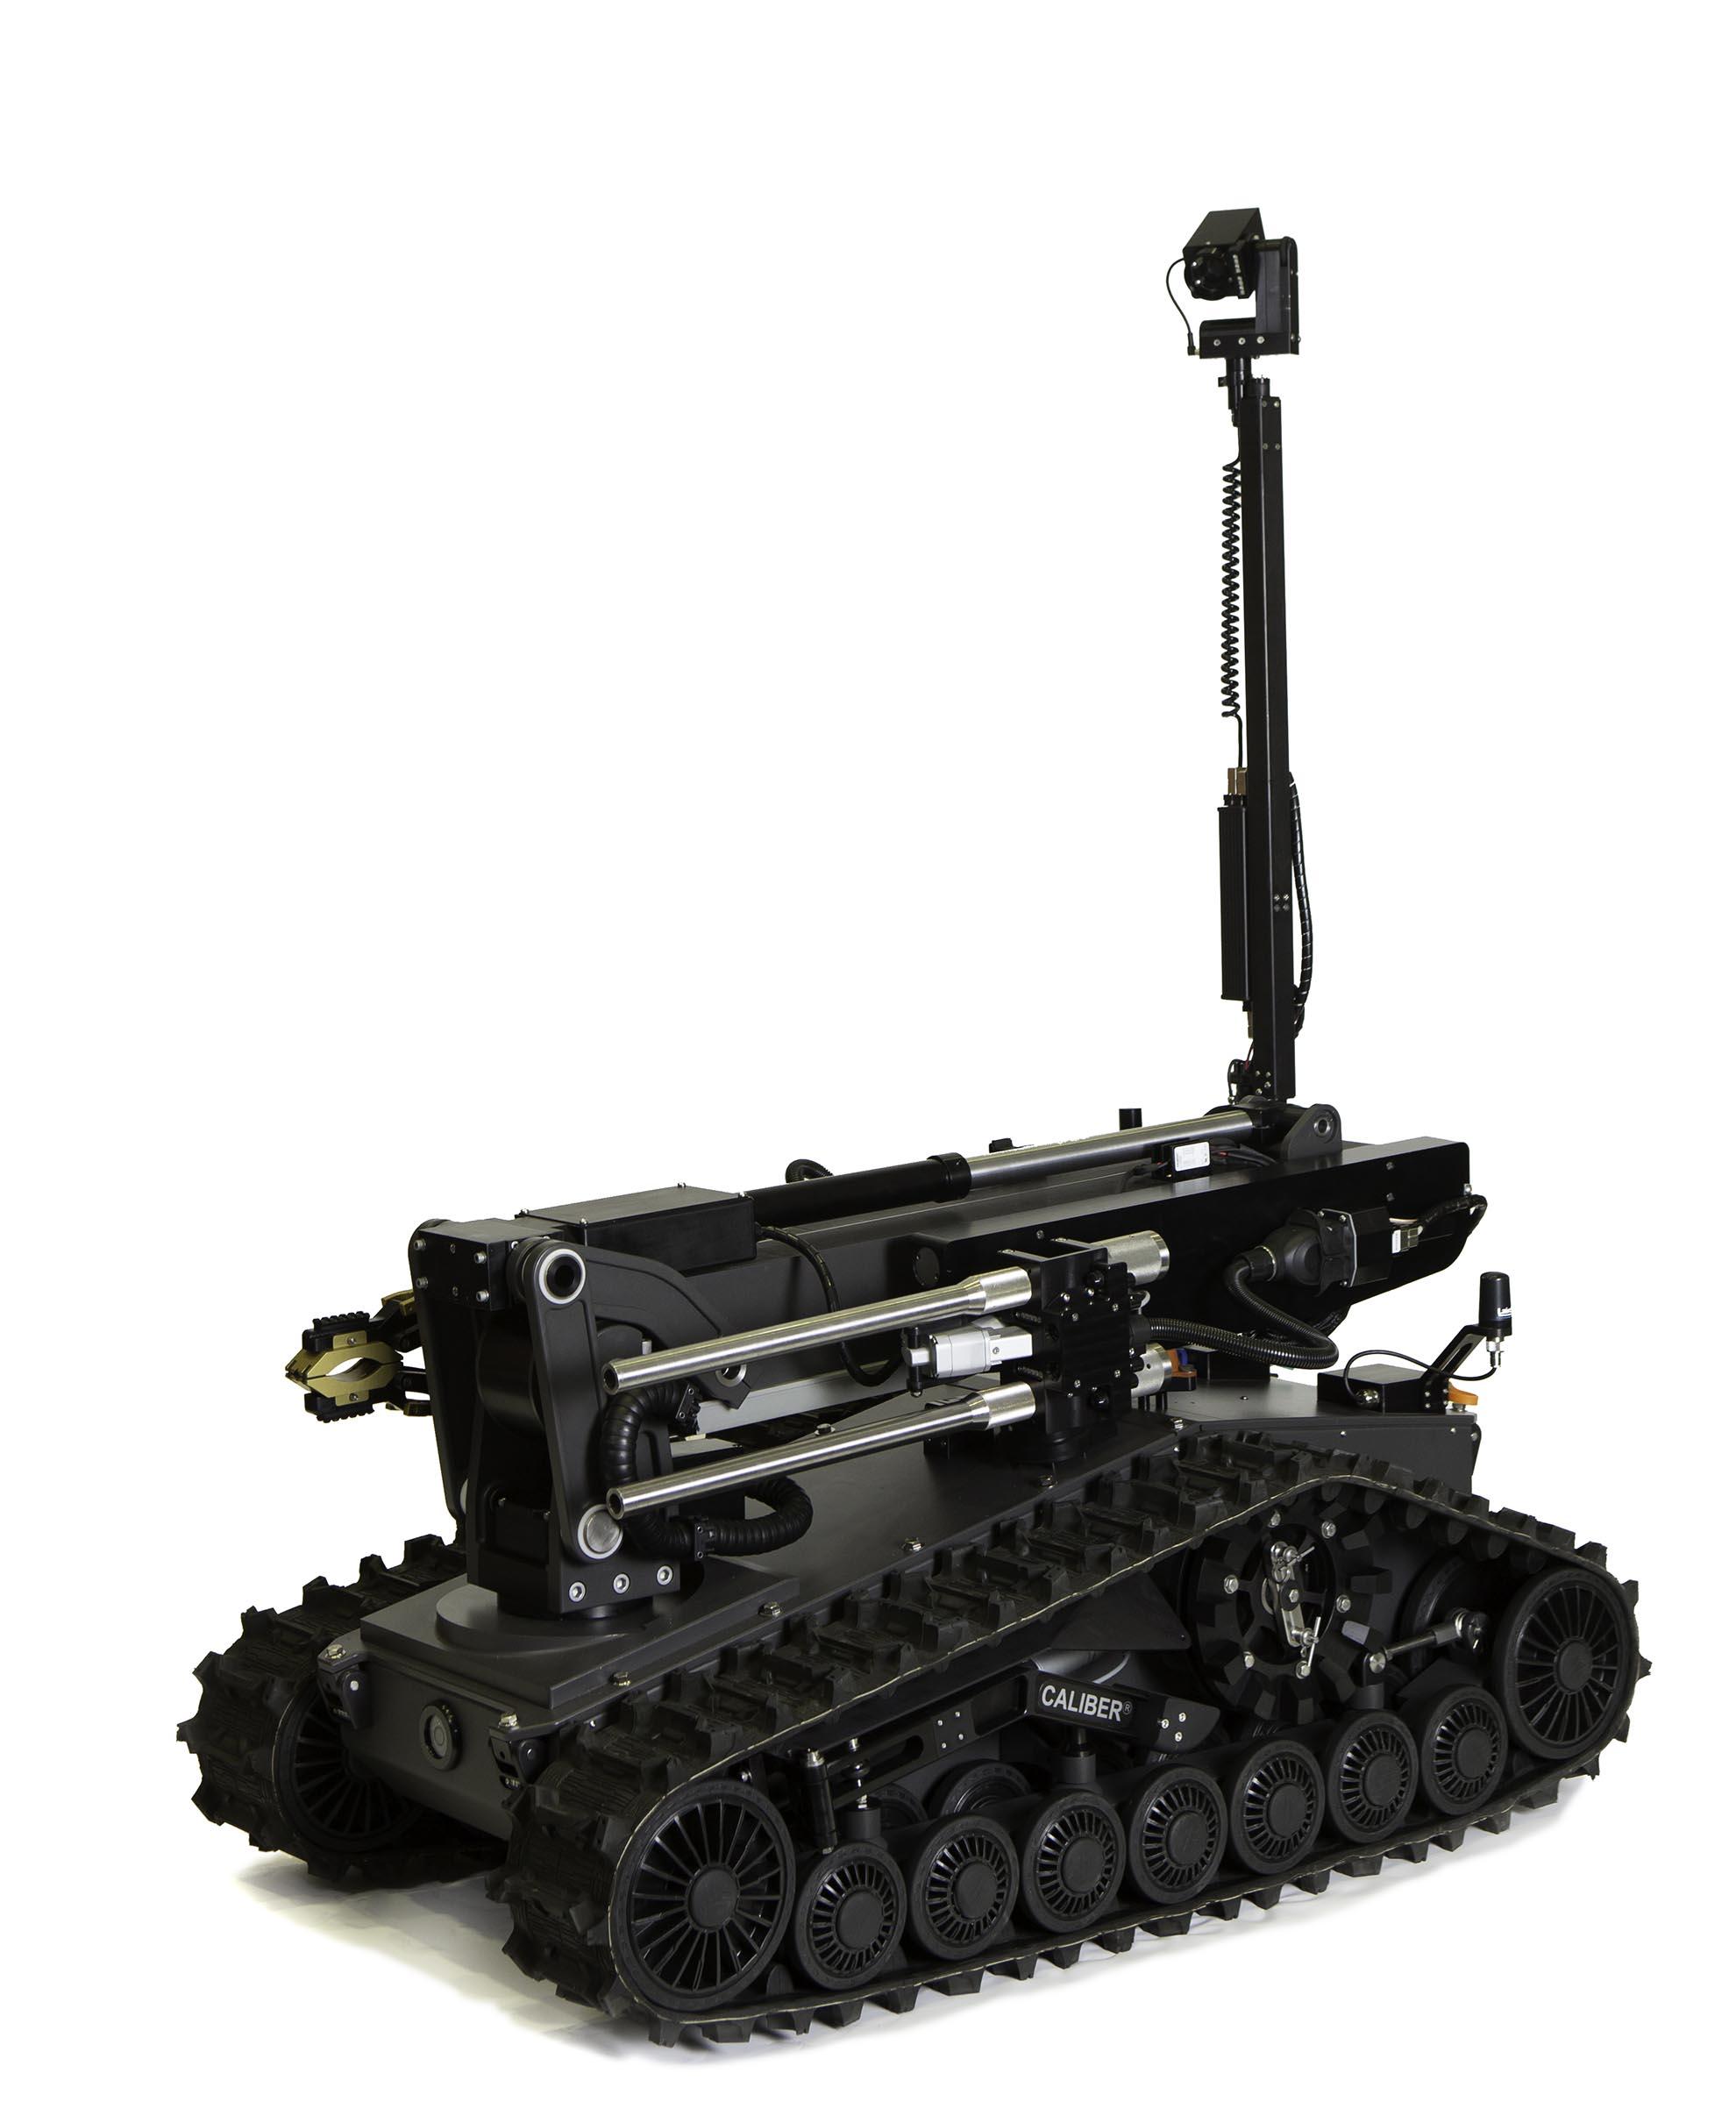 caliber-mk4-lvbied-robot-stowed-with-ptz